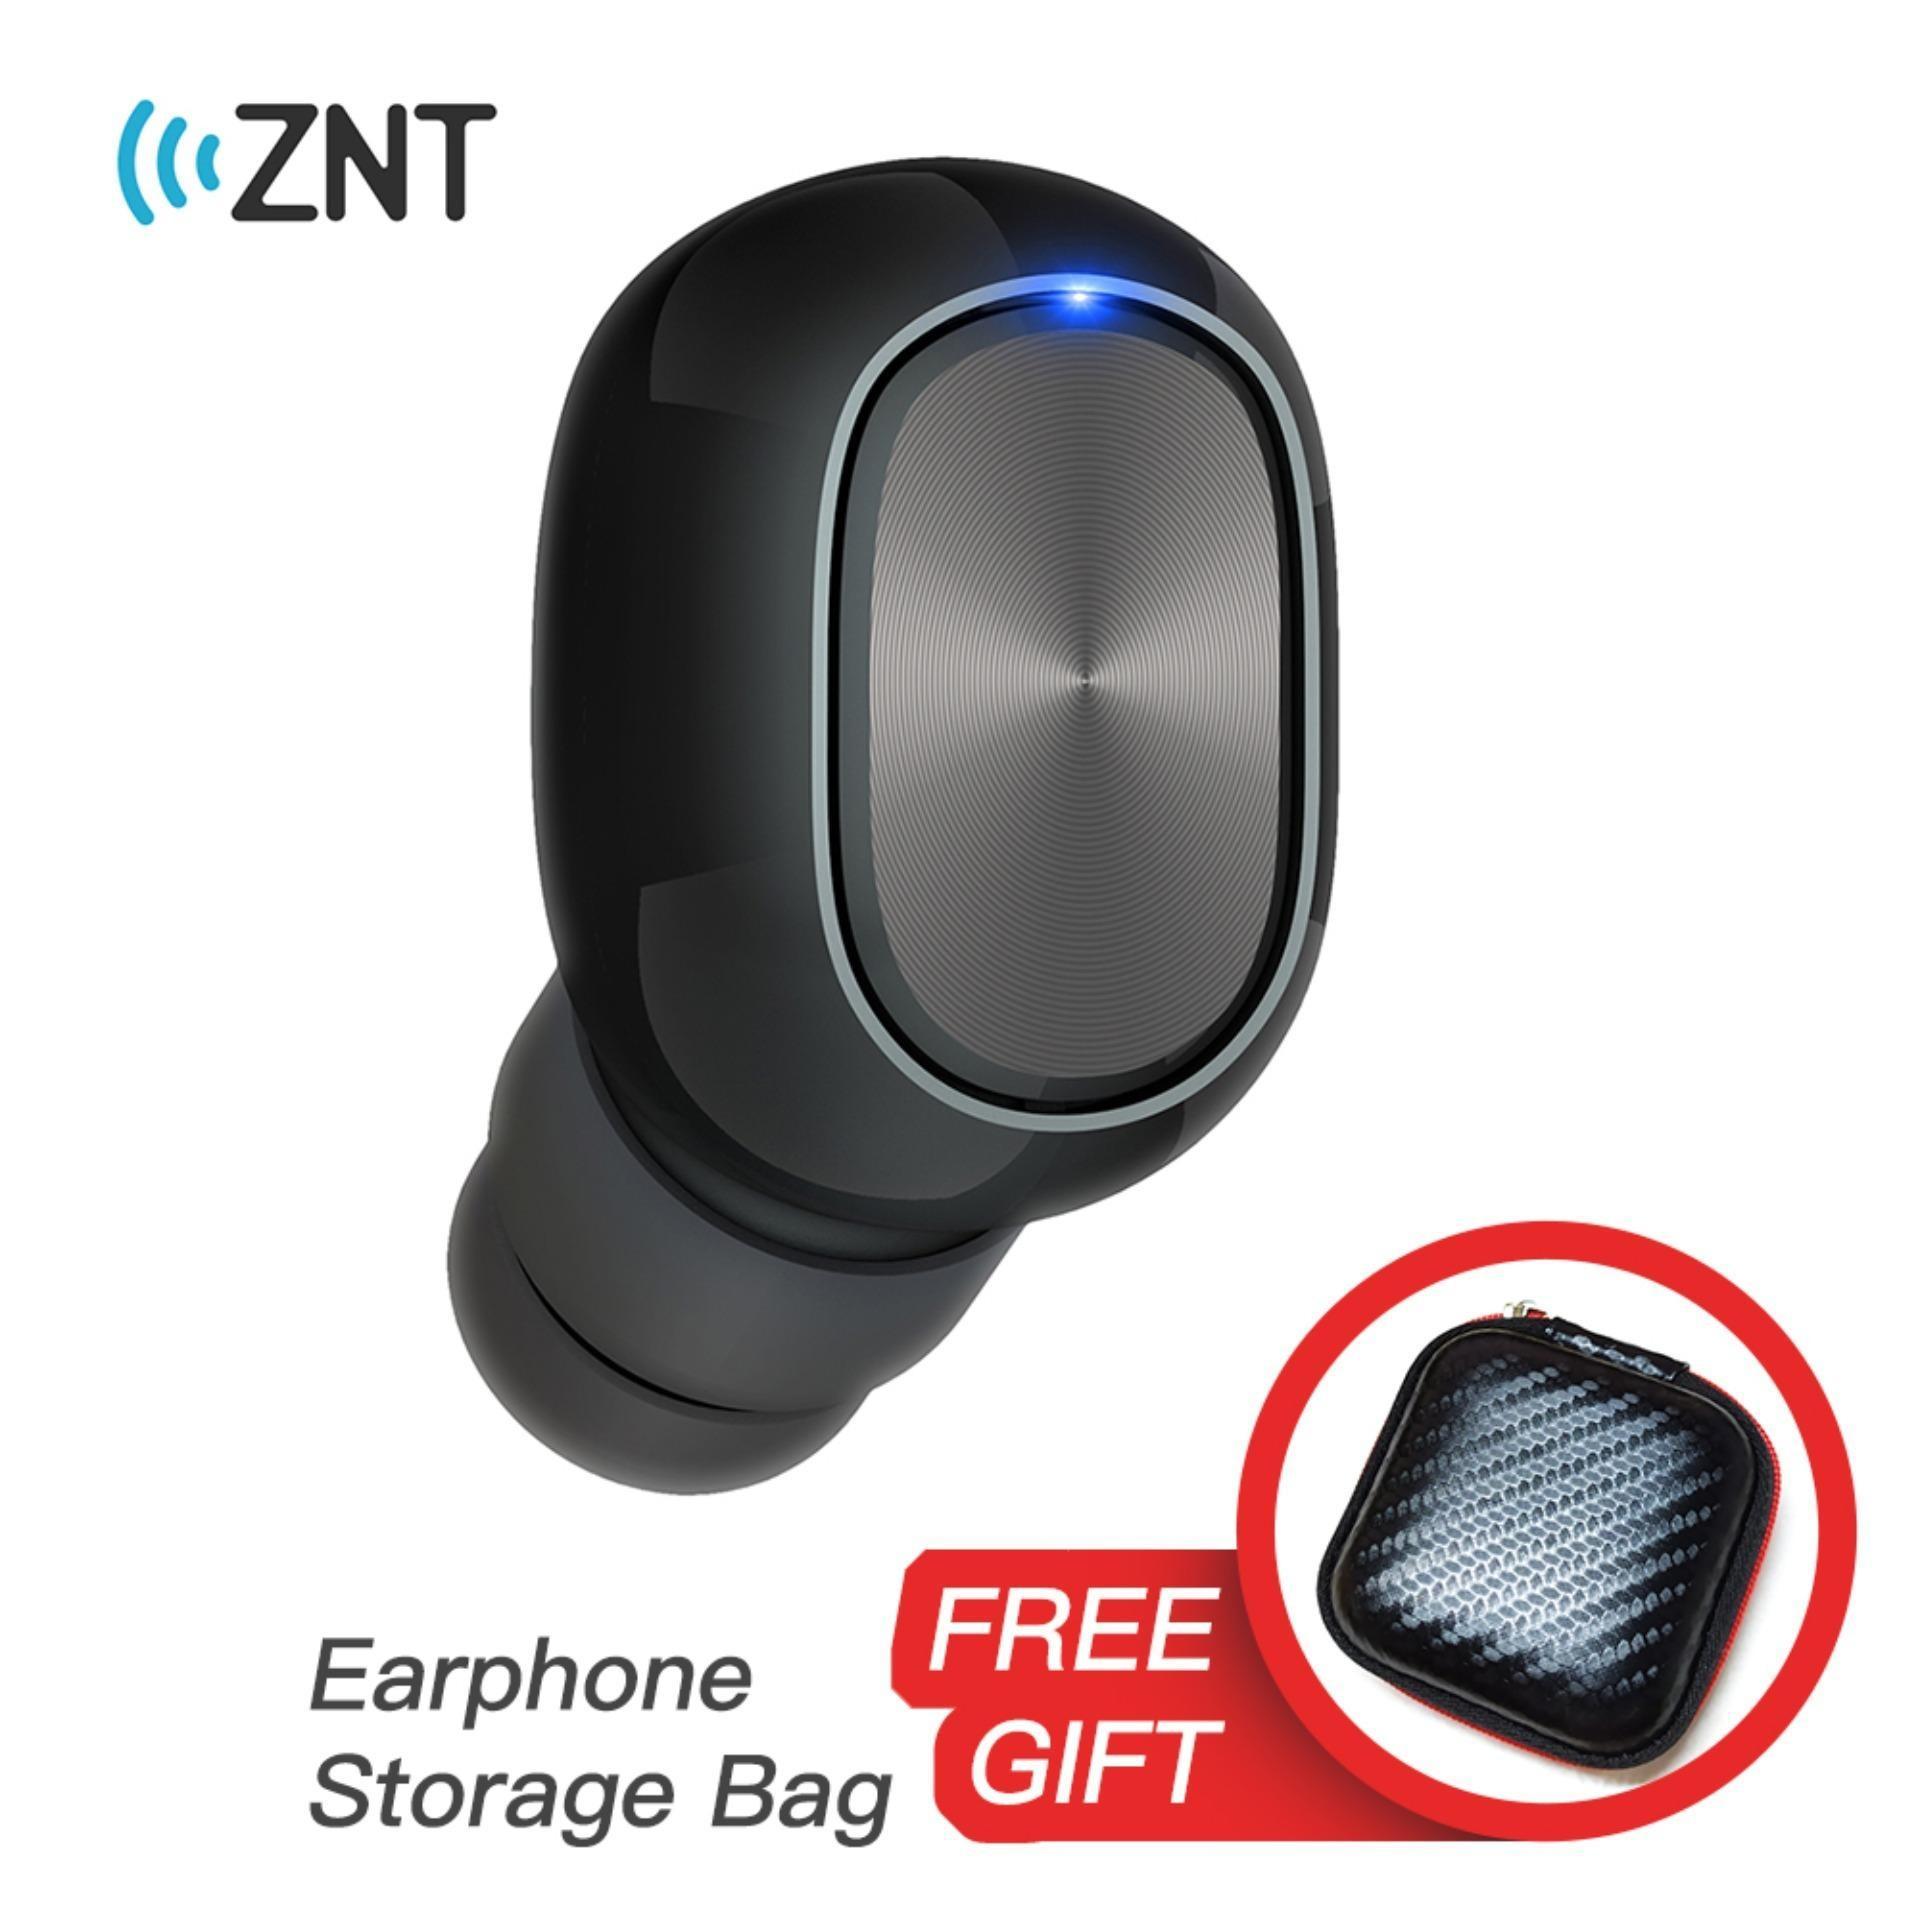 Buy Headphones Online | Headsets | Lazada sg